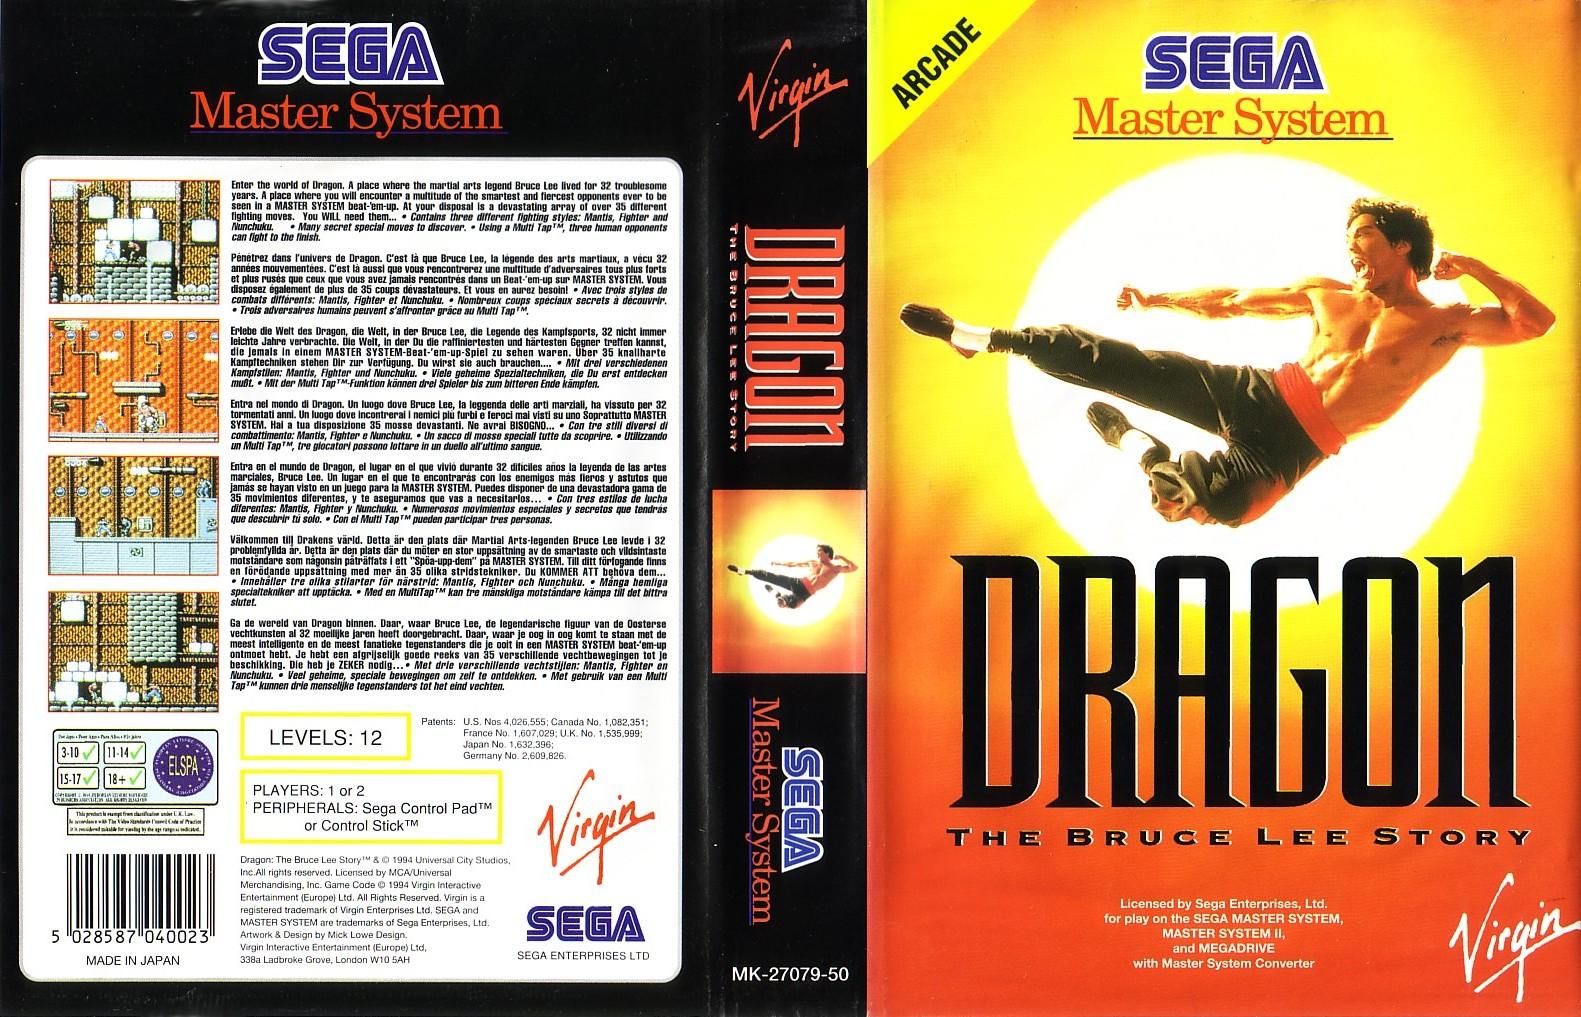 Sega Master System D Game Covers Box Scans Box Art CD ...